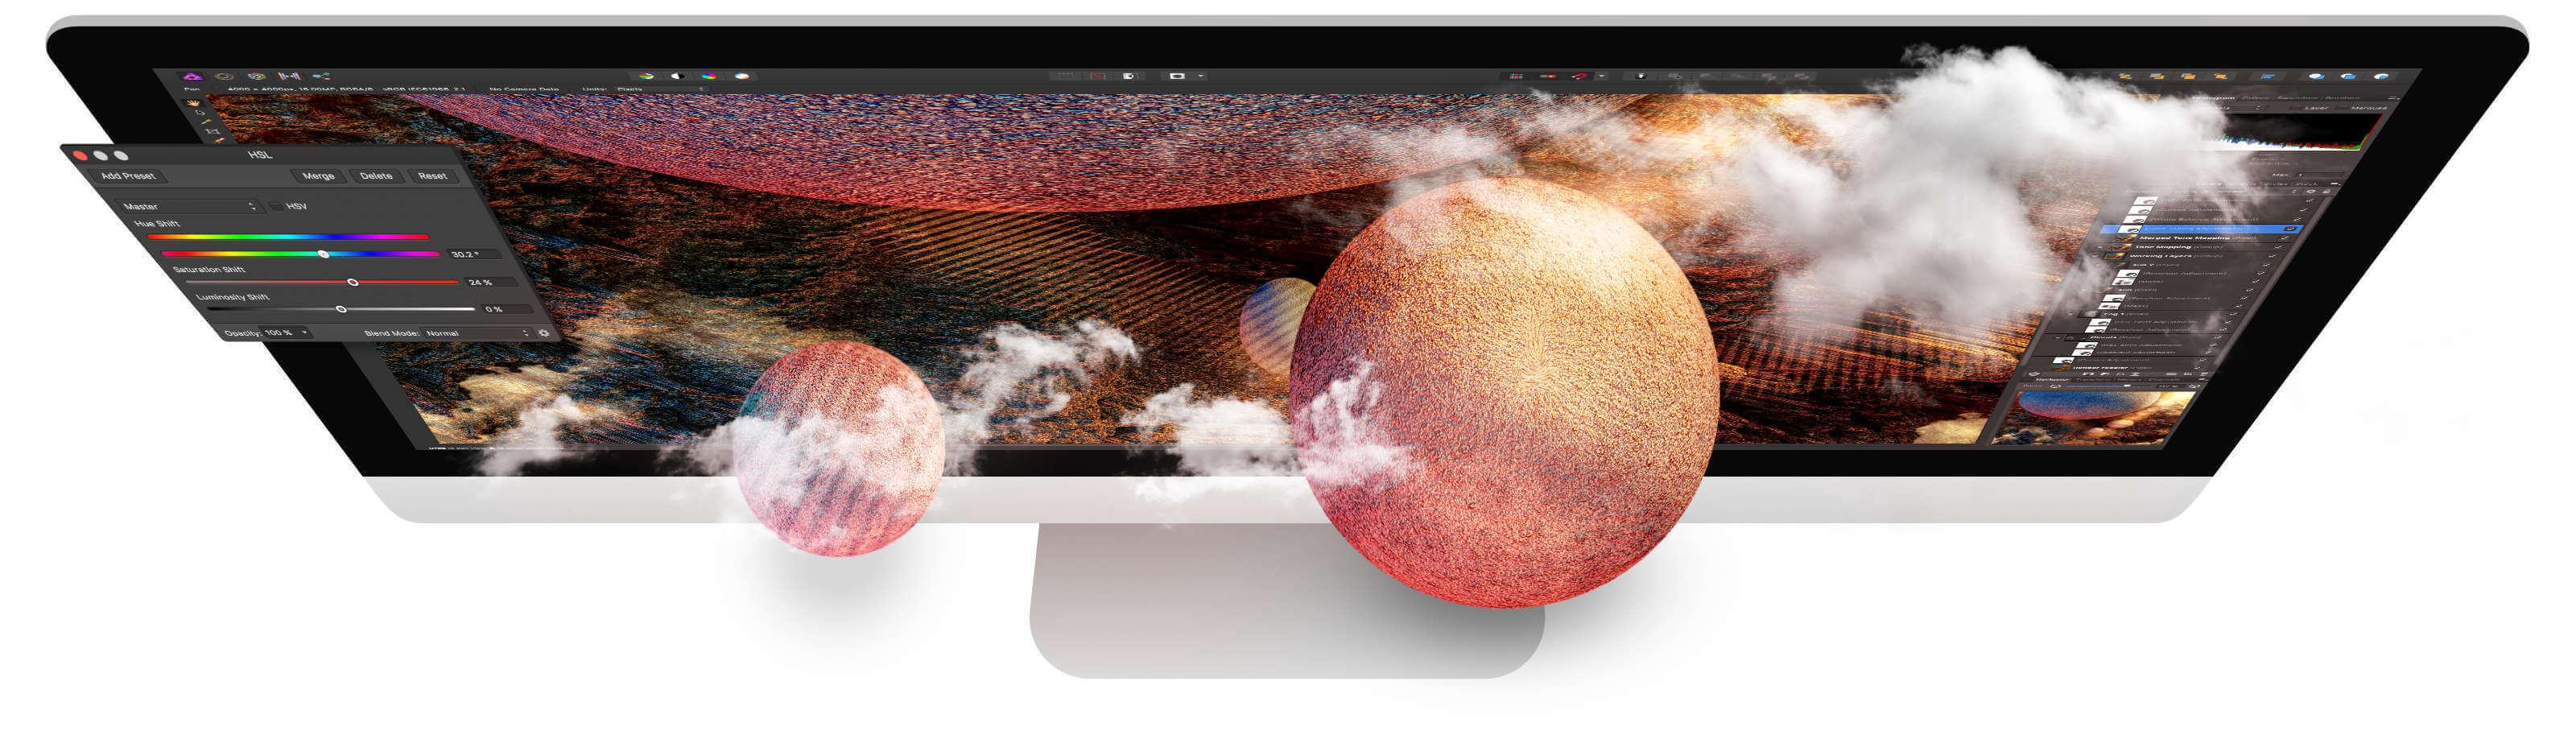 Affinity Photo V 1.8.2 MAC & V1.8.0.532 WIN – 完美的Photoshop替代方案